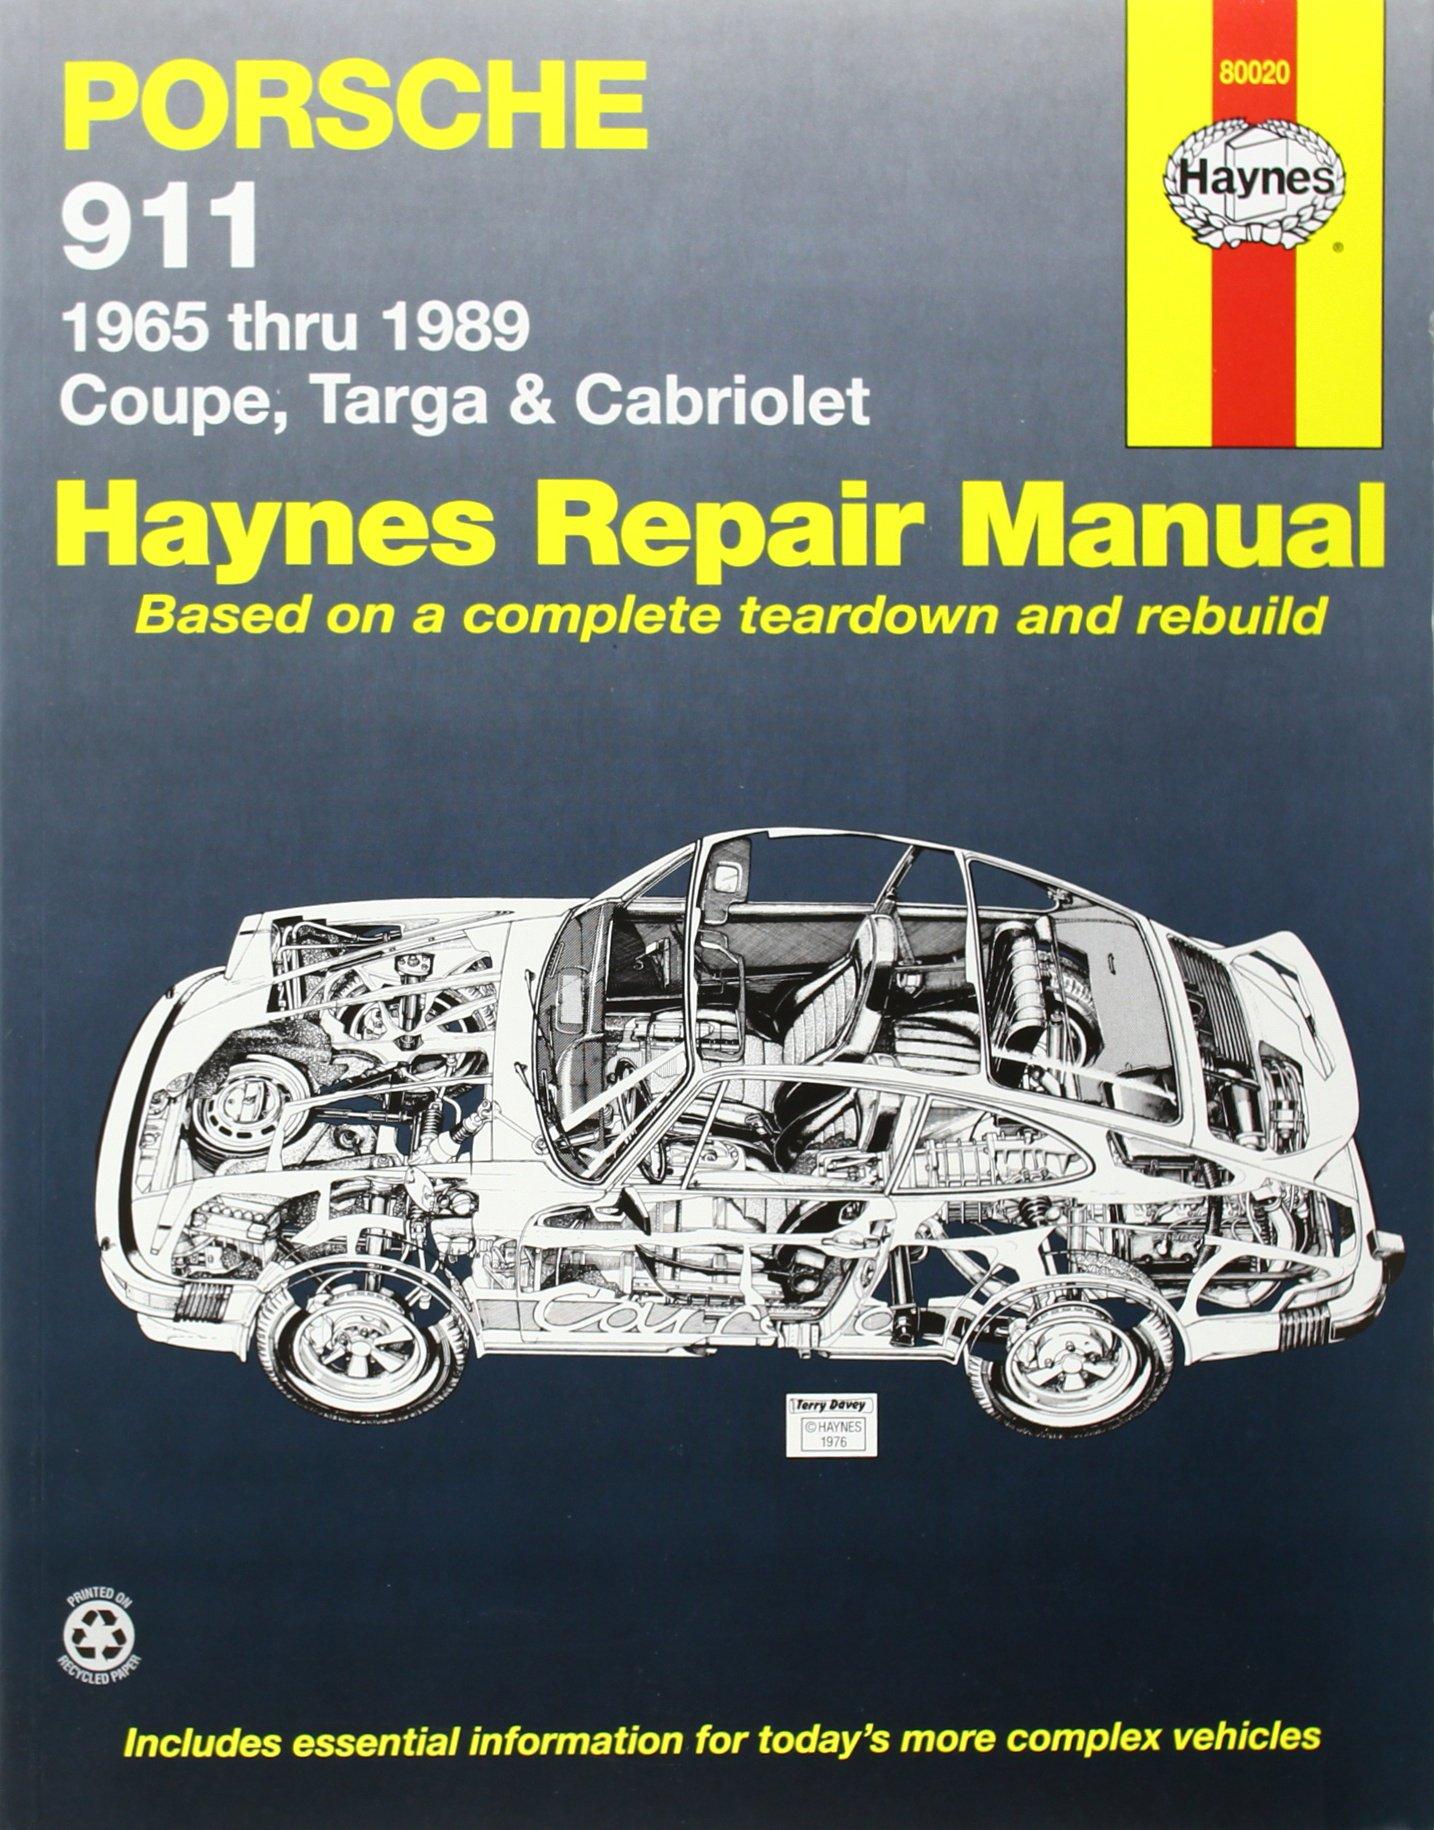 Porsche 911: Automotive Repair Manual, 1965 to 1989 - Coupe, Targa &  Cabriolet: Haynes: 0038345002649: Amazon.com: Books